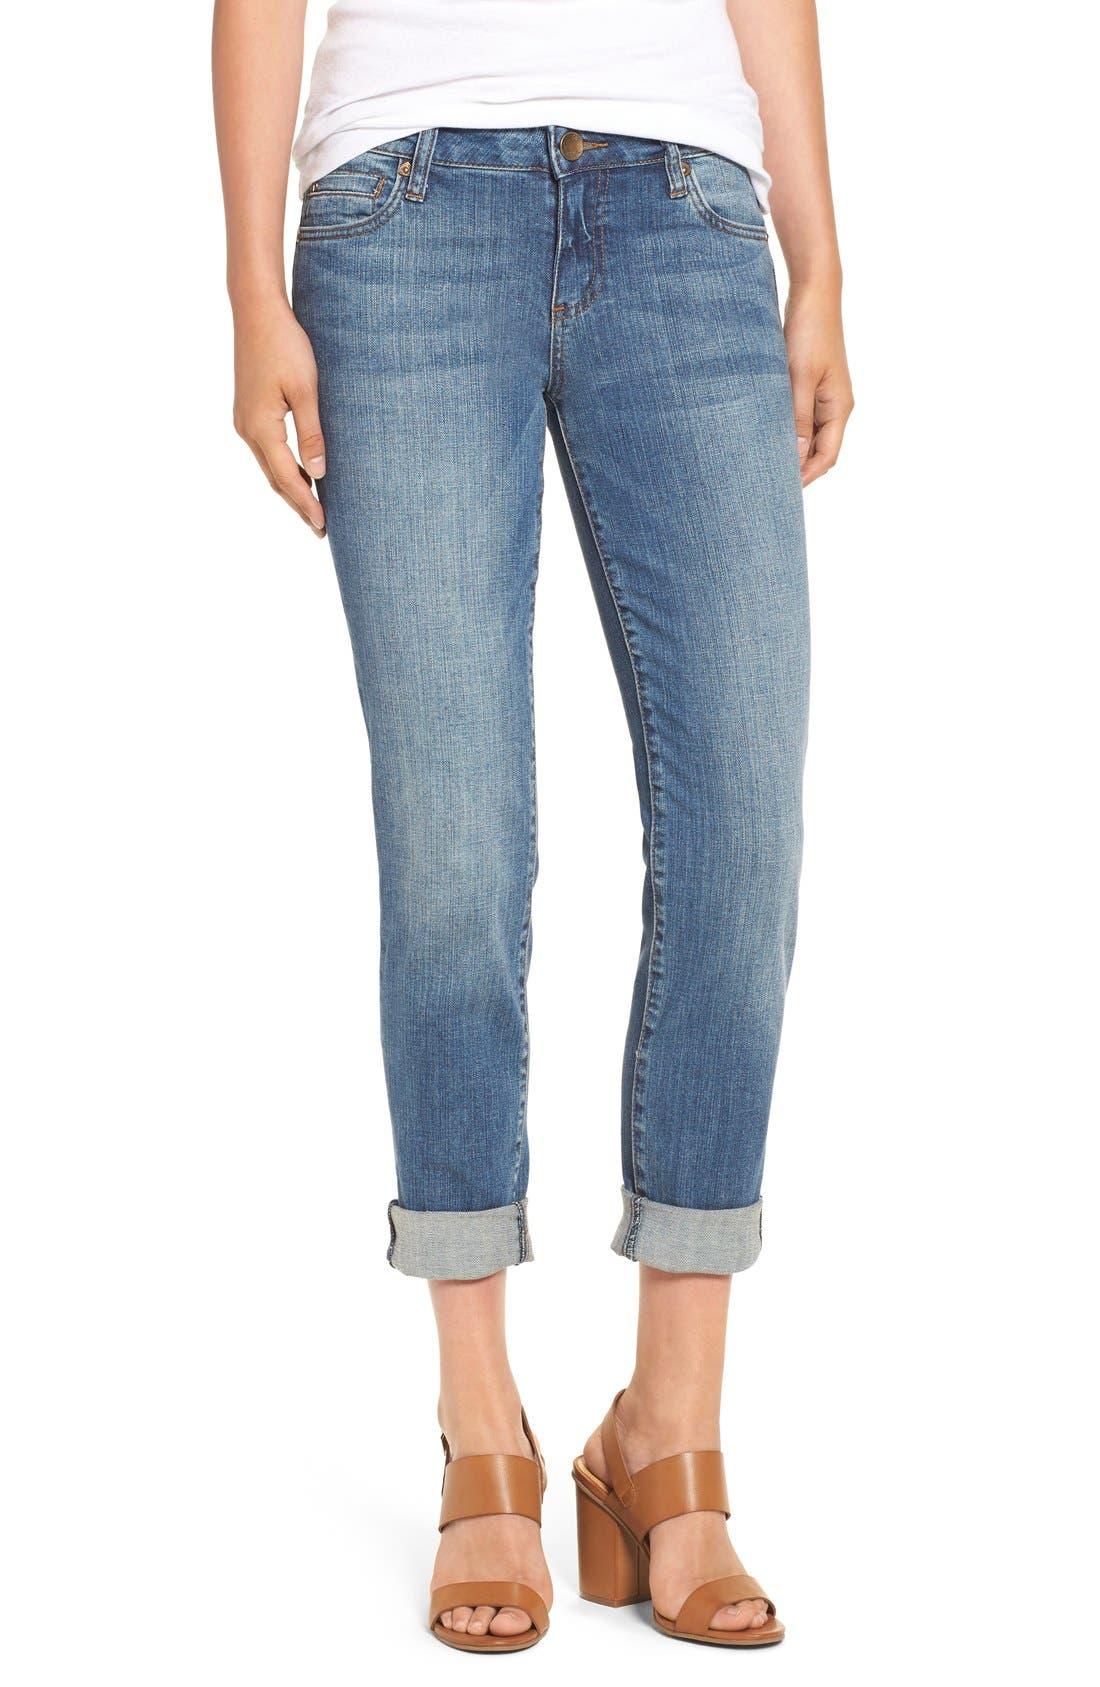 Main Image - KUT from the Kloth 'Catherine' Slim Boyfriend Jeans (Fervent) (Regular & Petite)